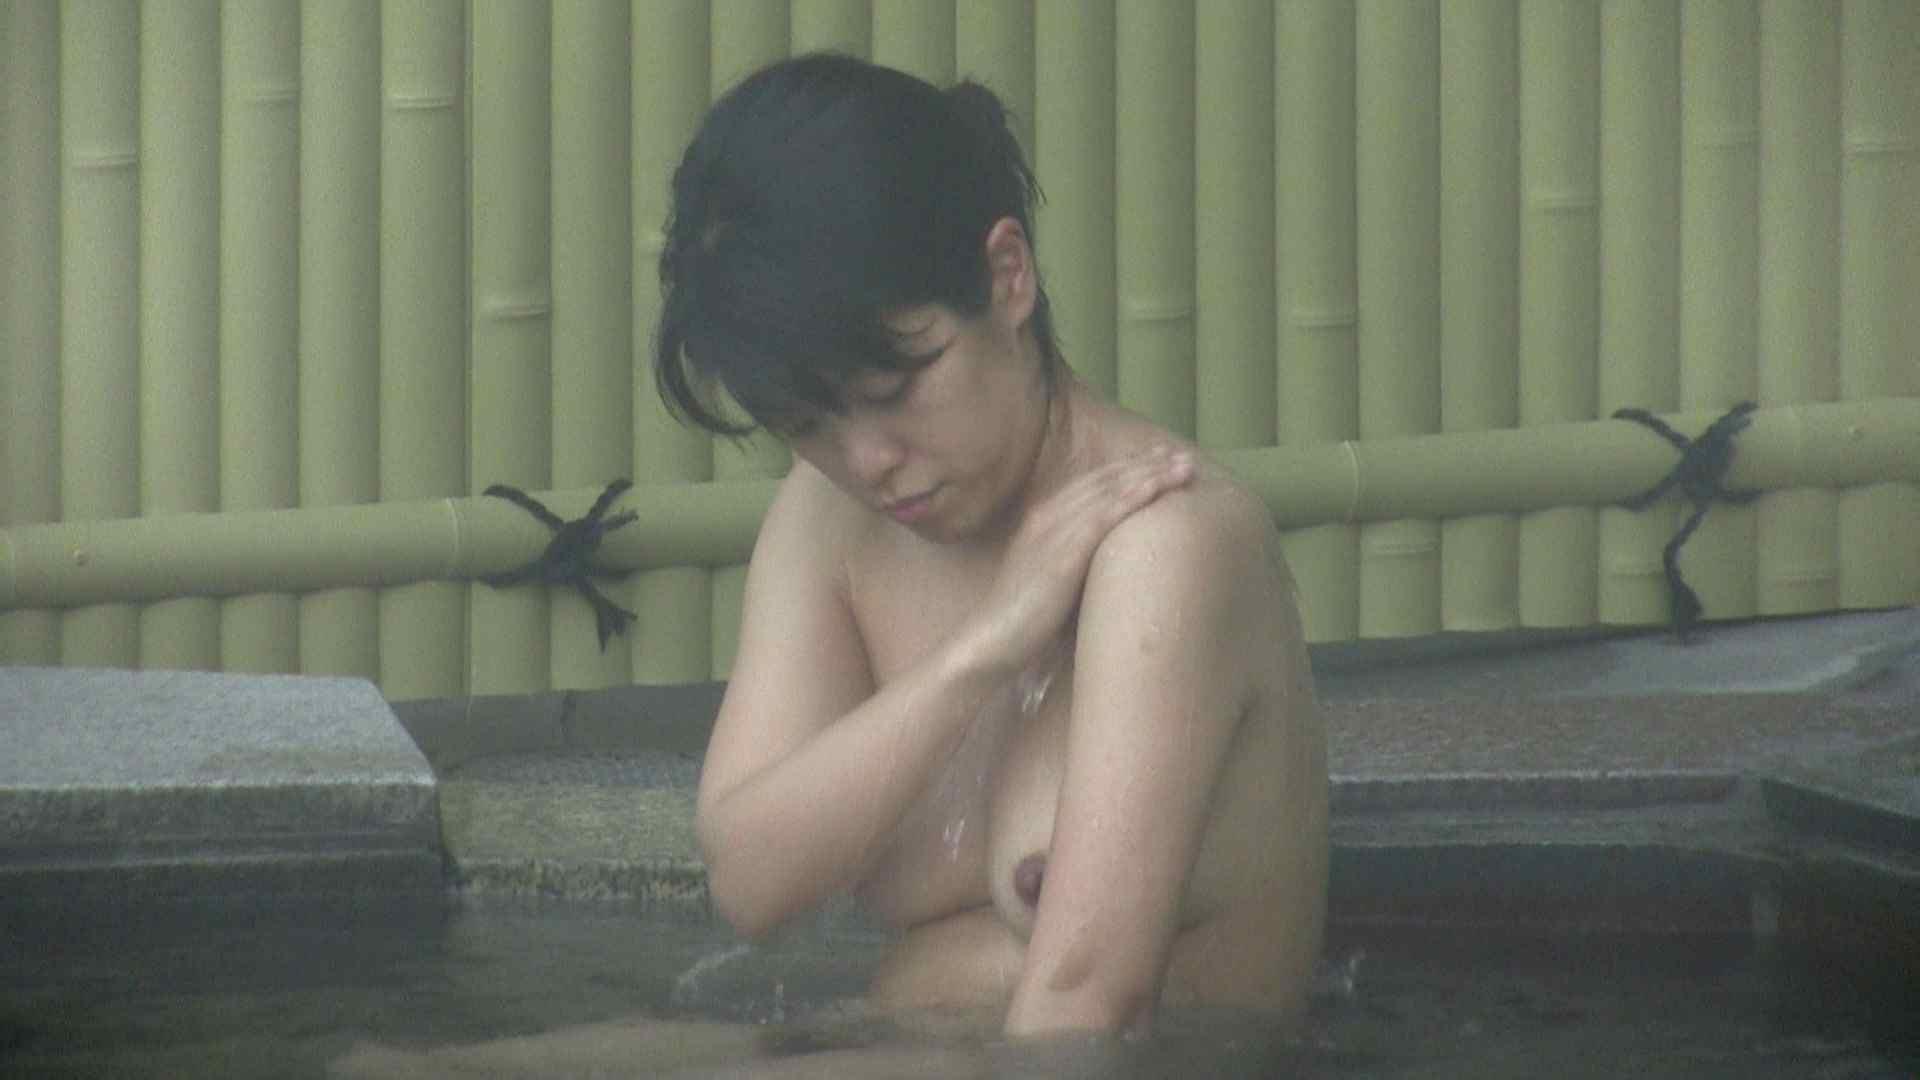 Aquaな露天風呂Vol.585 露天 オマンコ無修正動画無料 51画像 38